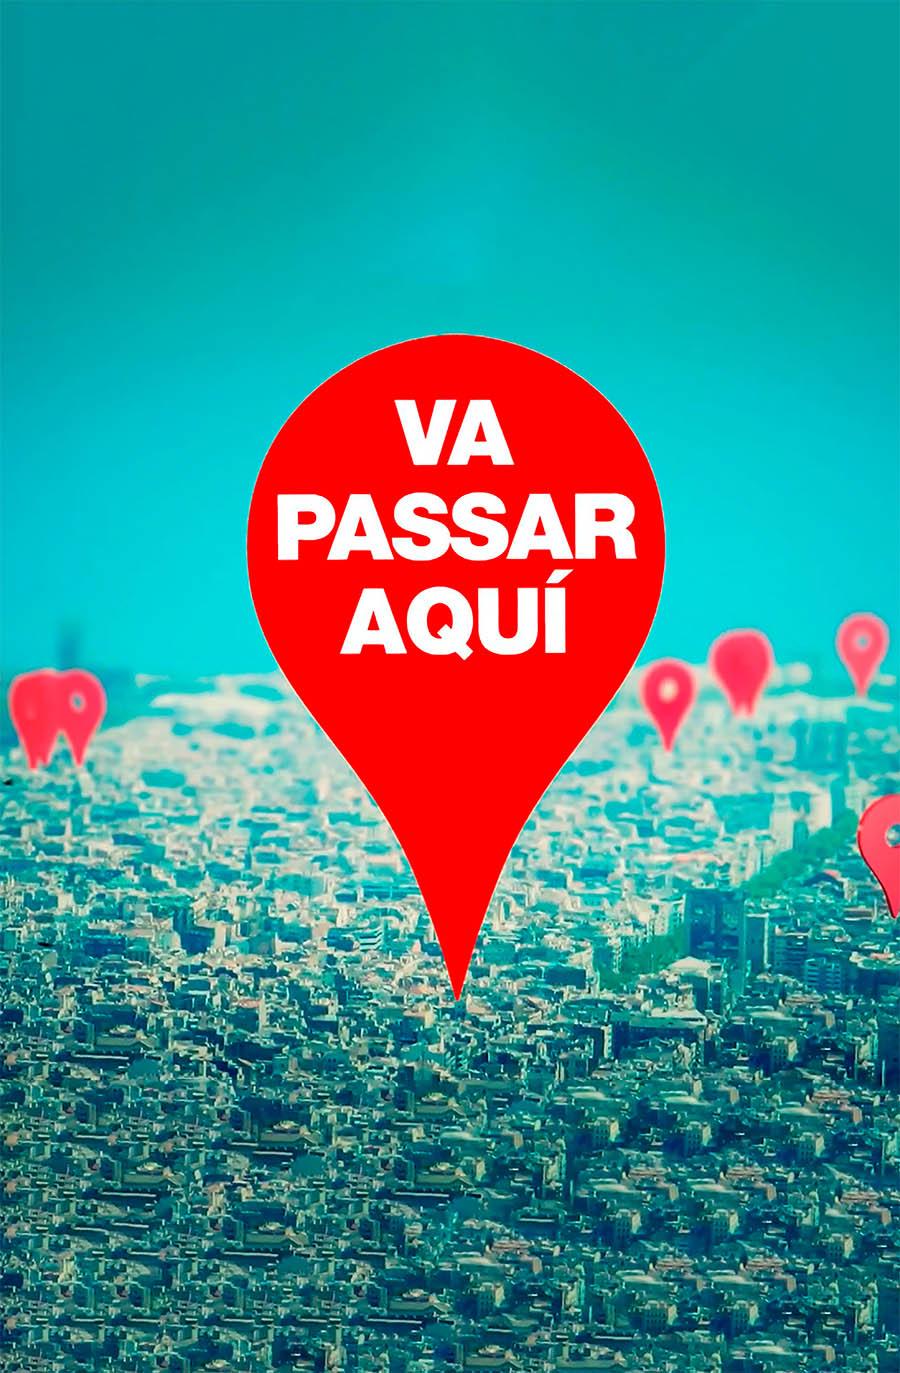 https://visiona.tv/wp-content/uploads/2019/06/VPA_vertical-copy.jpg